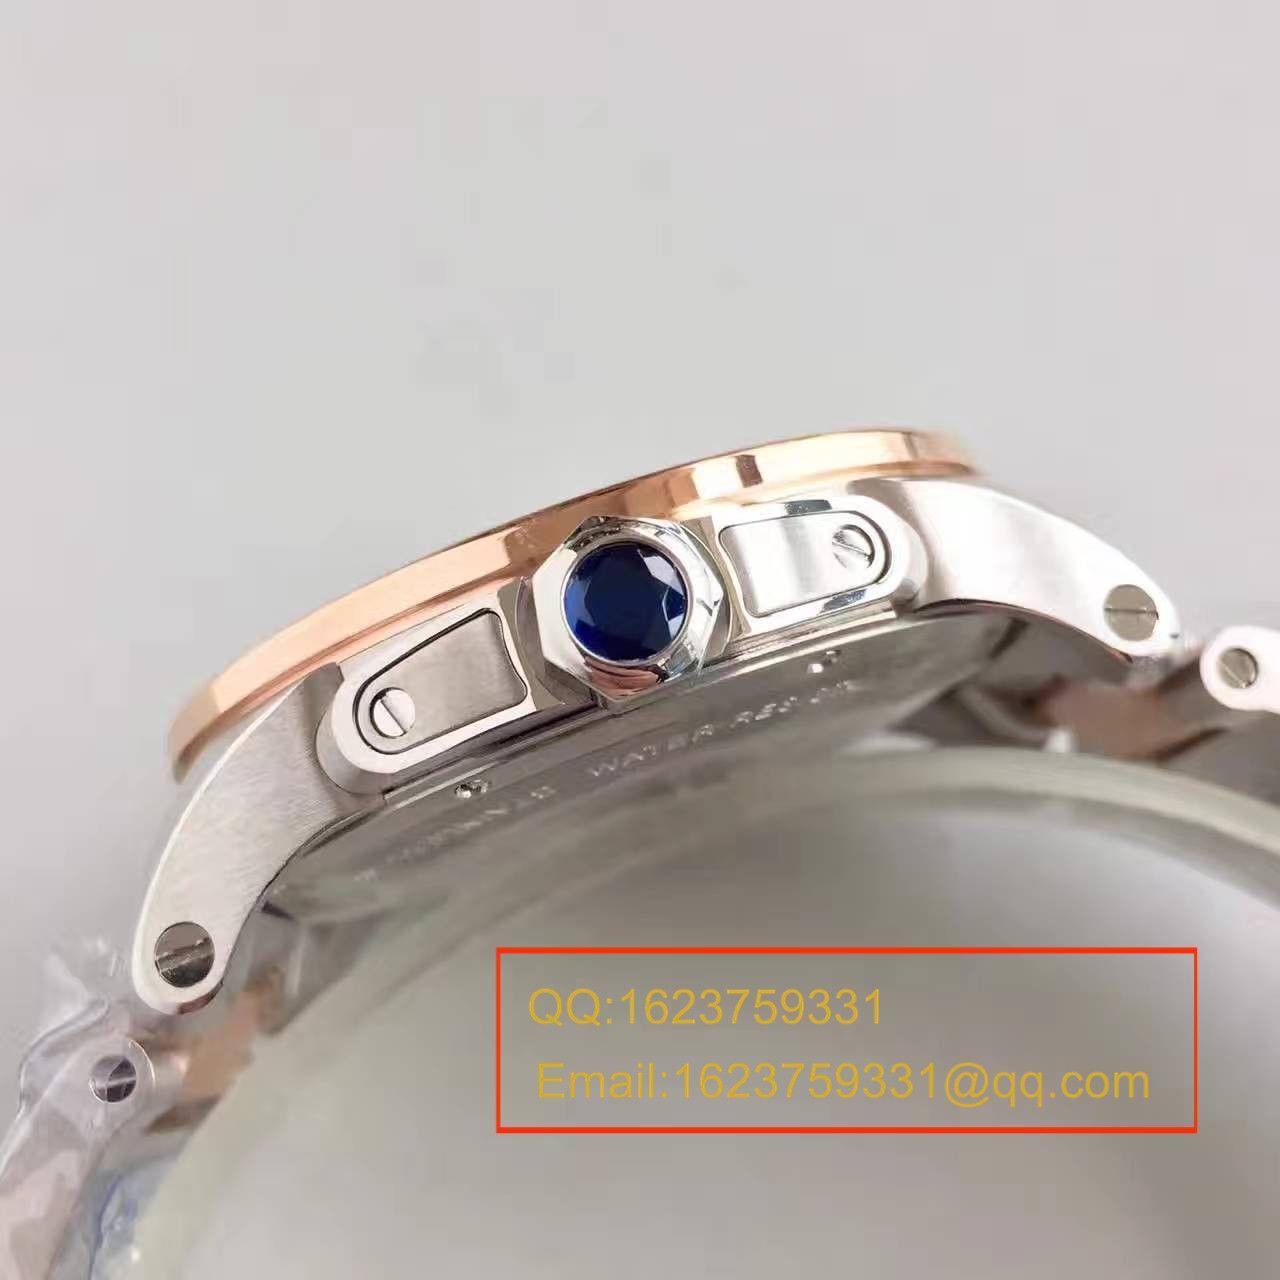 【JF厂顶级复刻手表】卡地亚卡历博 系列W7100036腕表 / KDY012